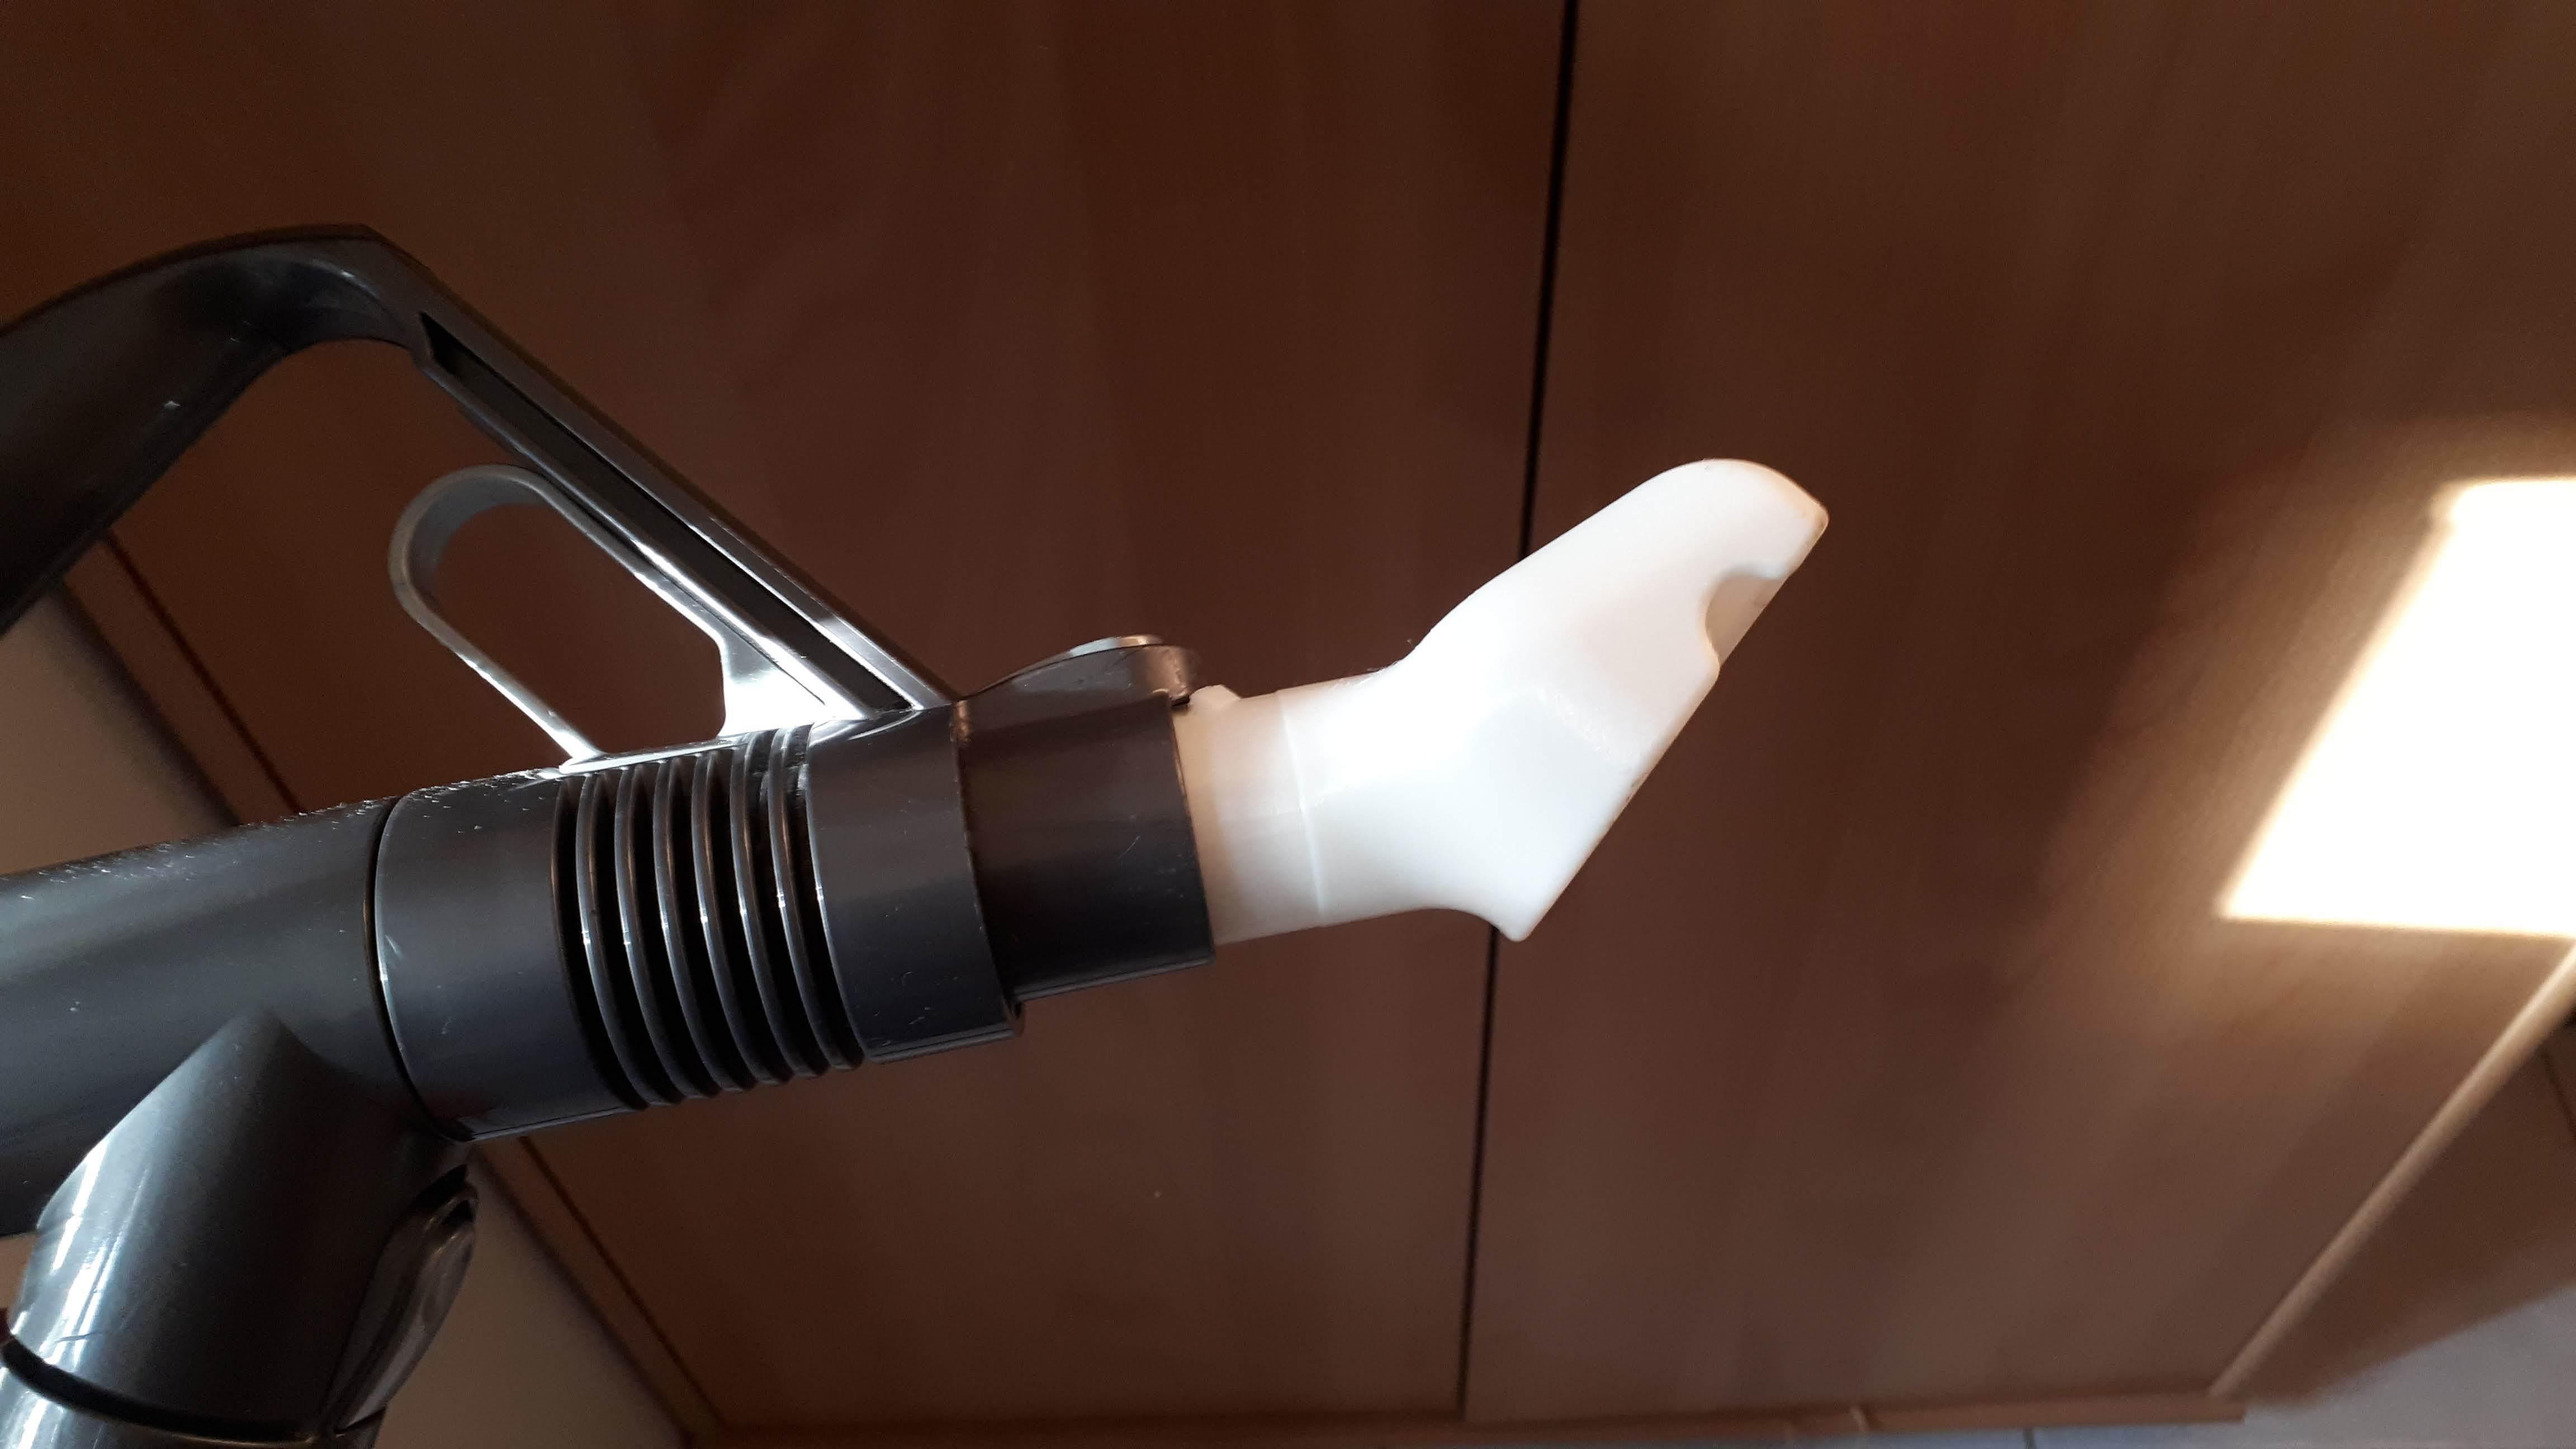 20200218_172117.jpg Download free STL file Dyson Tip • 3D printable object, Cyborg